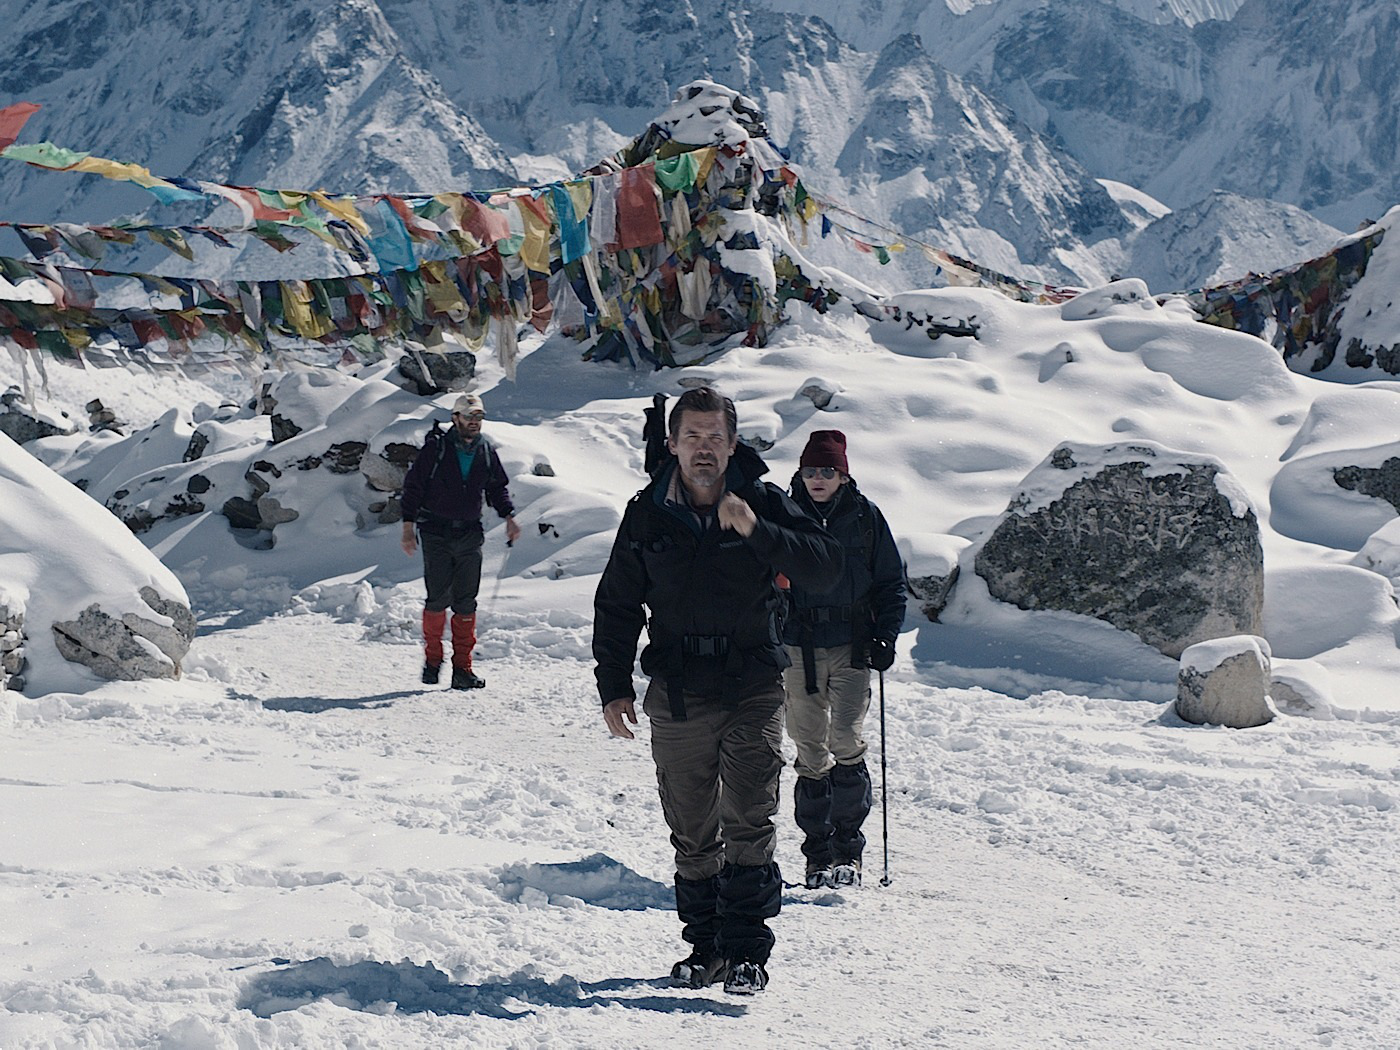 Josh Brolin in  Everest  - image via the  movie's official website .